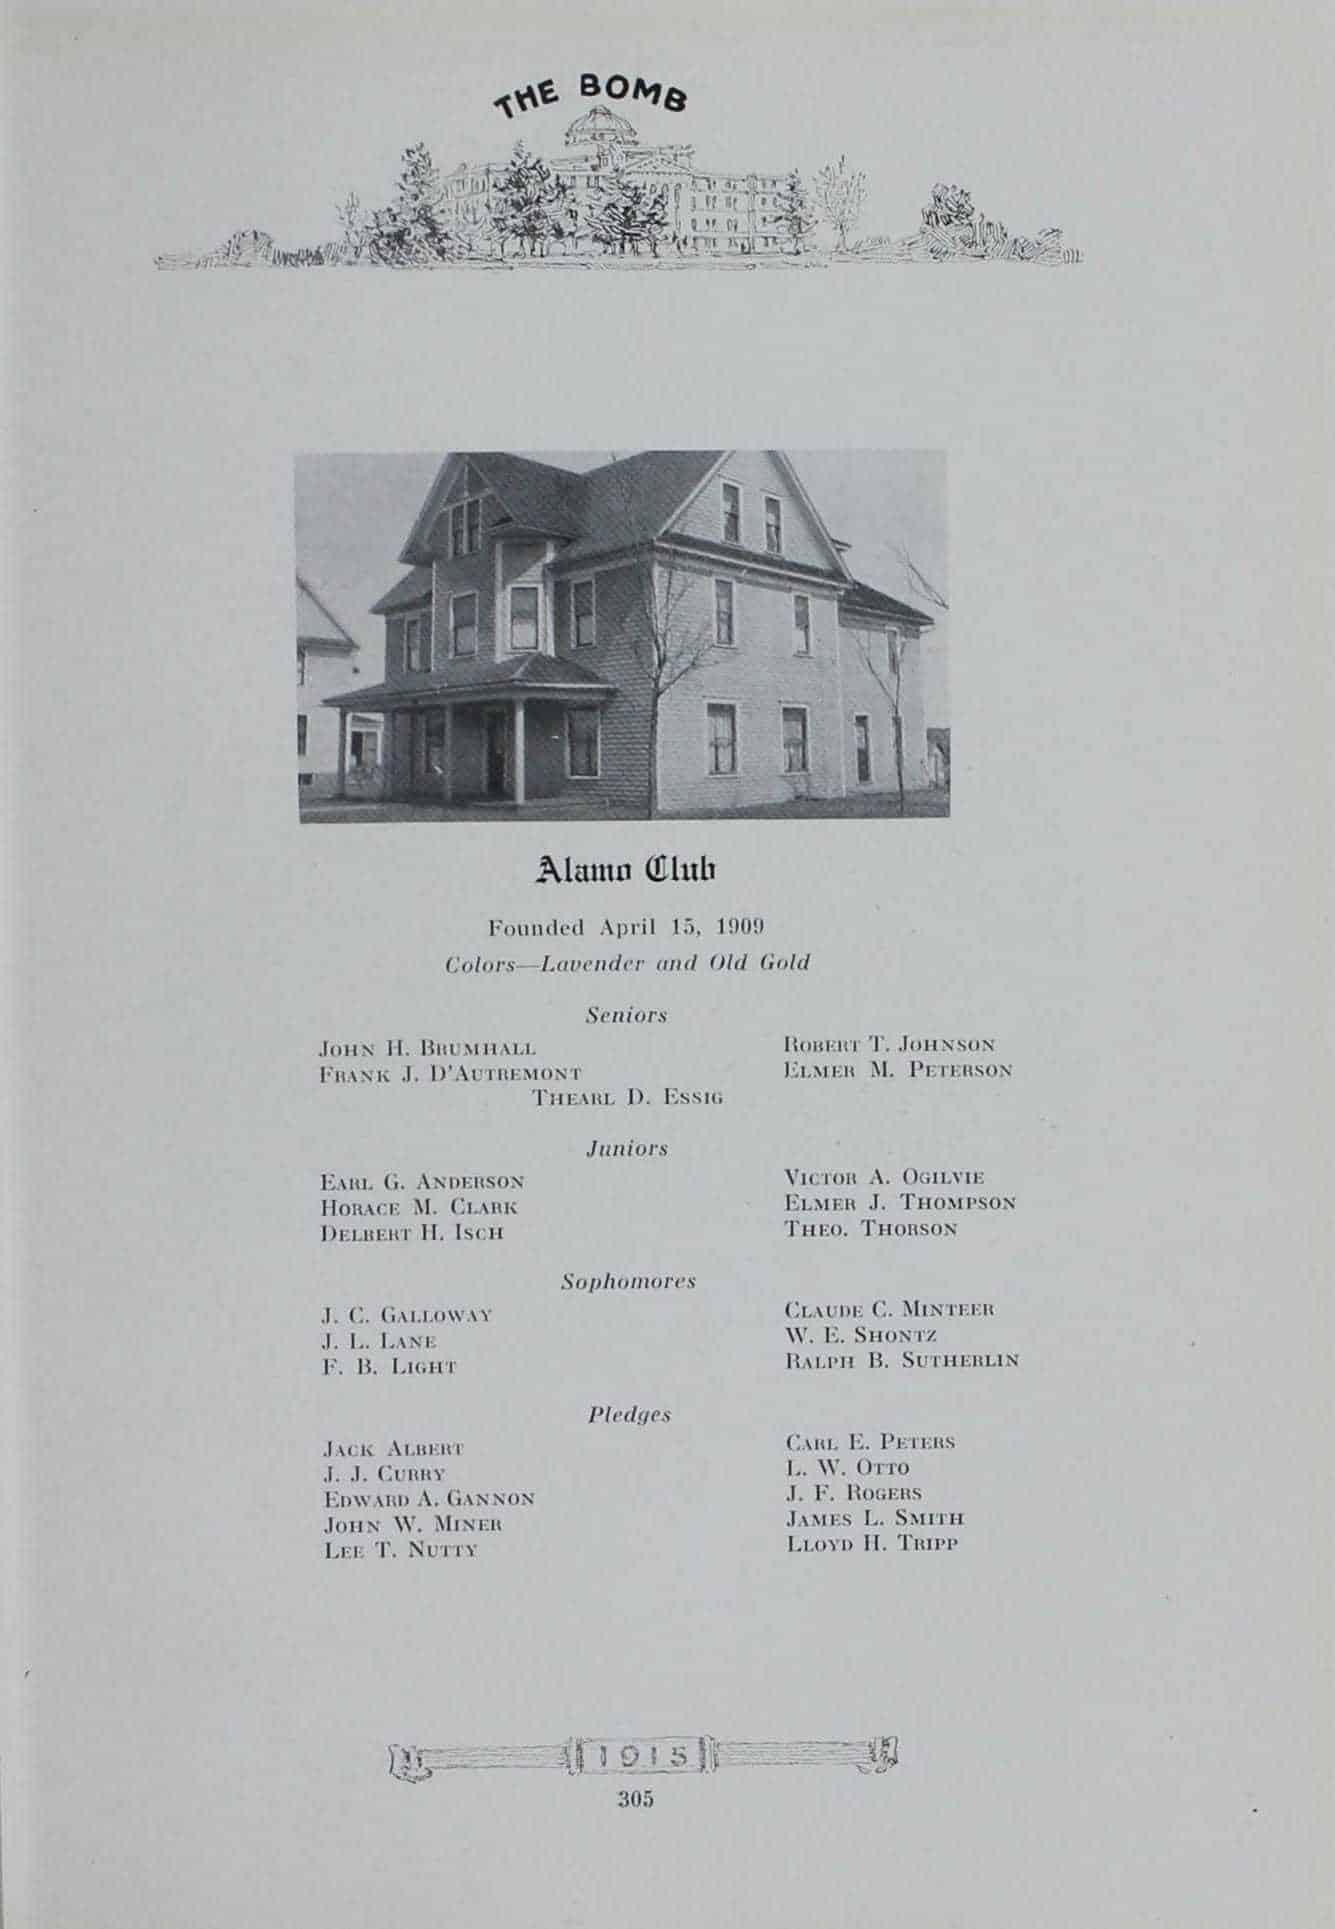 1914 Alamo Club Roster